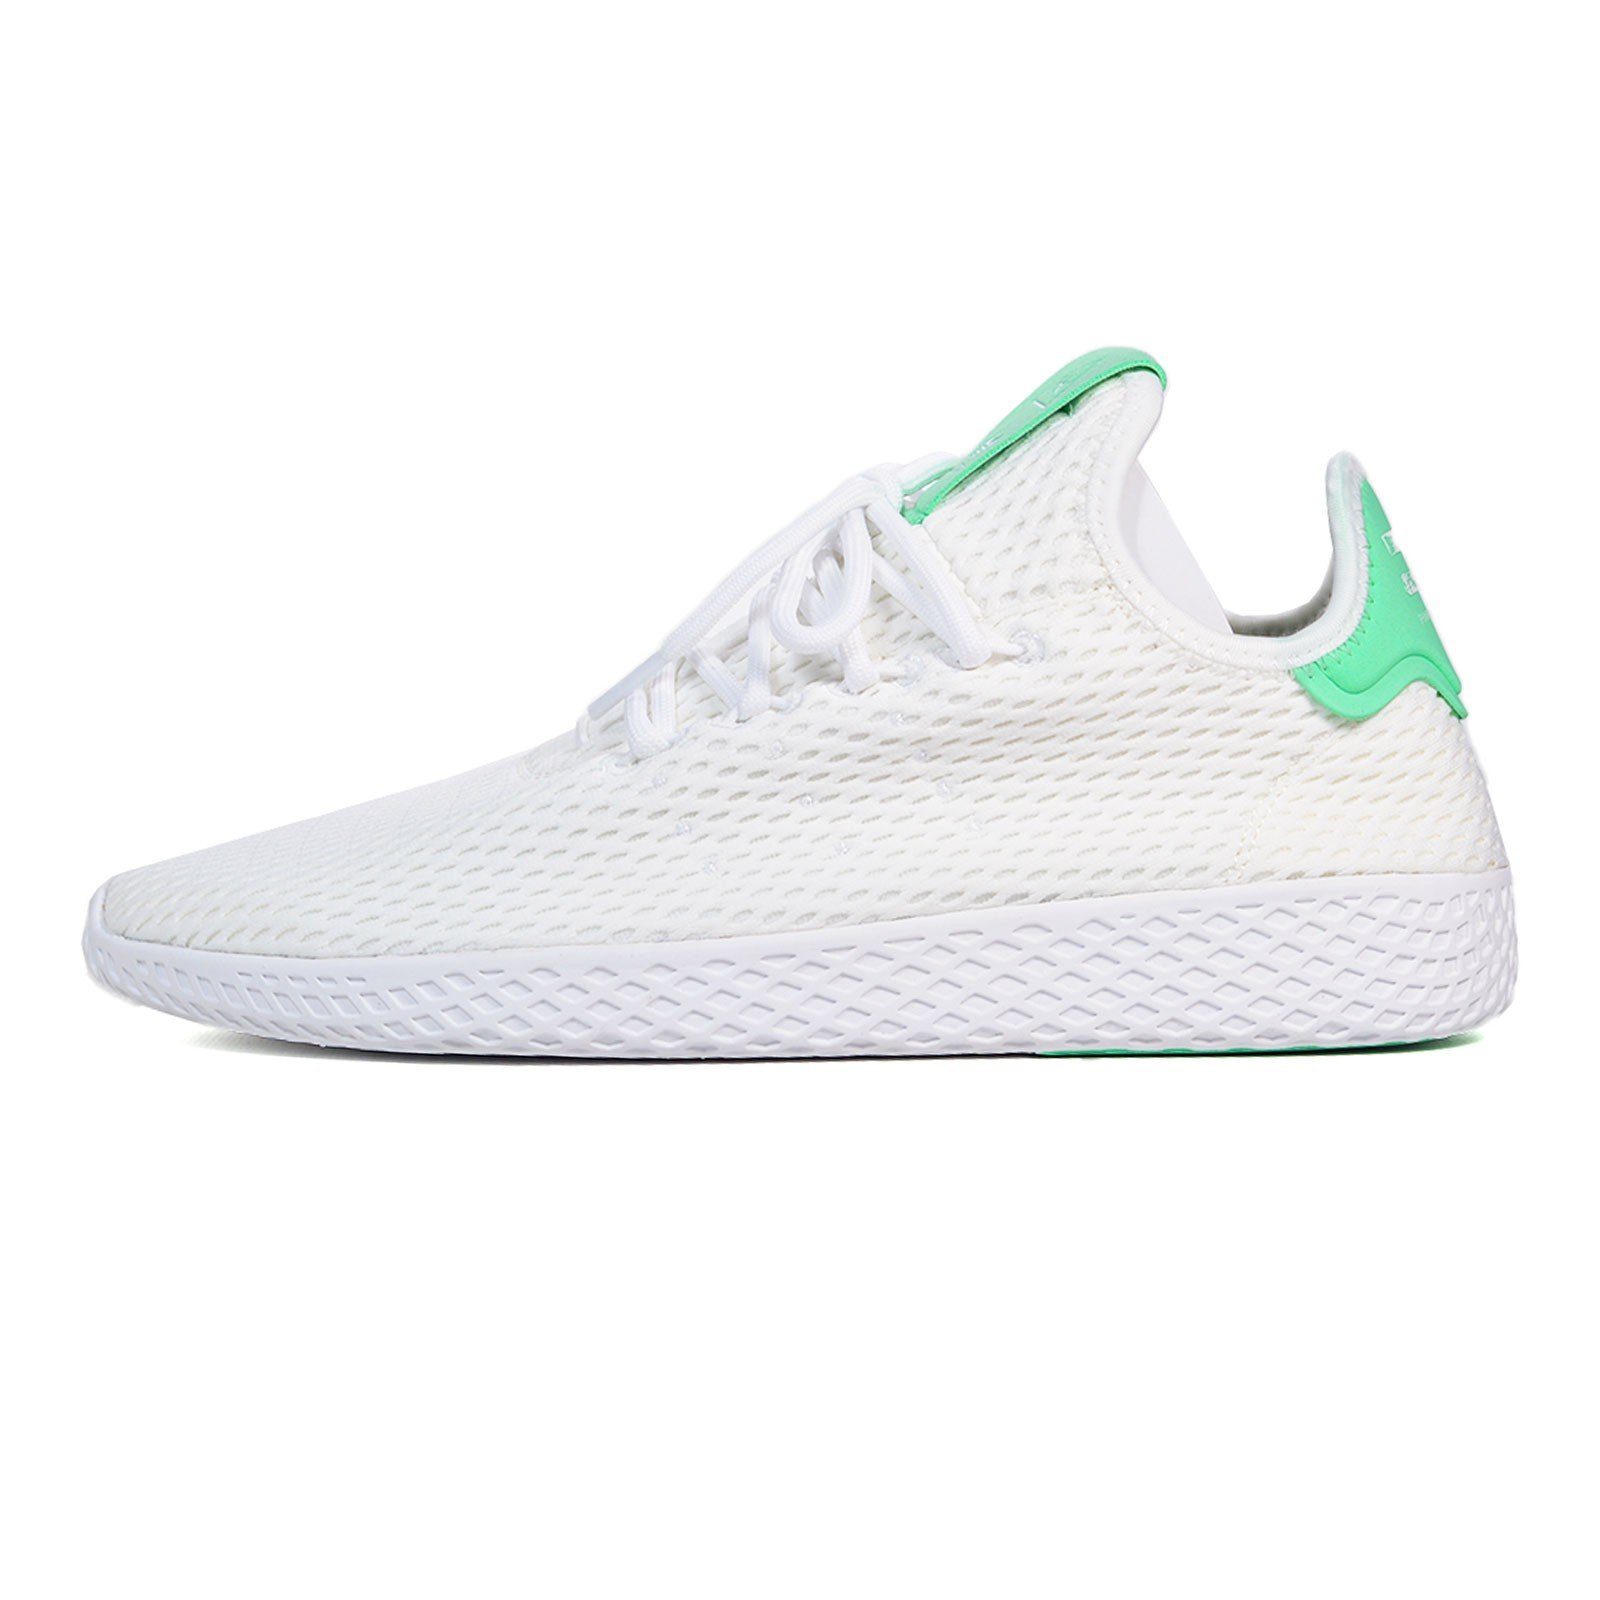 adidas PW Tennis Hu in White/Green Glow, 4.5